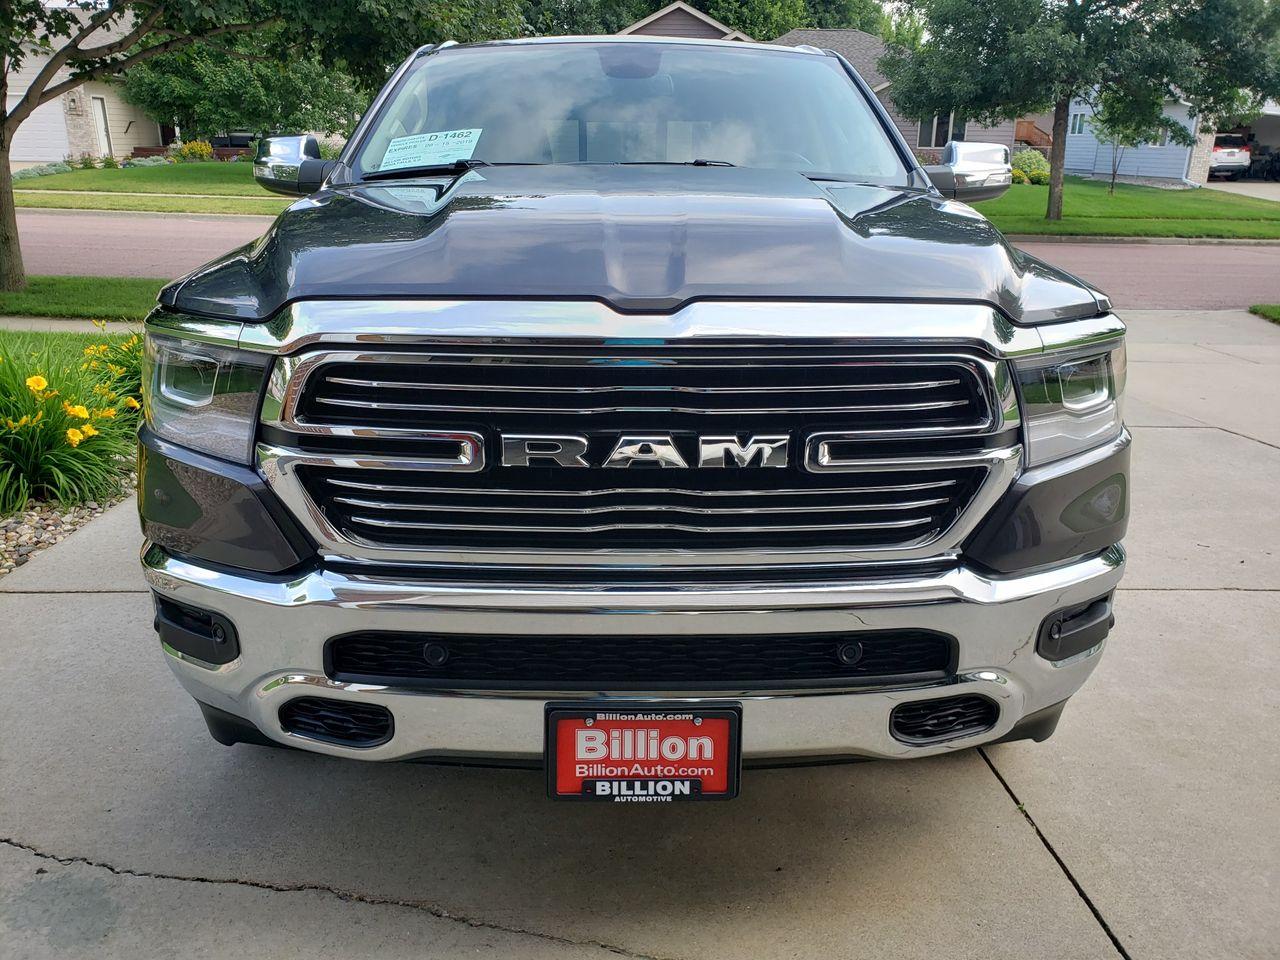 2019 Ram Ram Pickup 1500 Laramie   Brandon, SD, Granite Crystal Metallic Clear Coat (Gray), 4X4